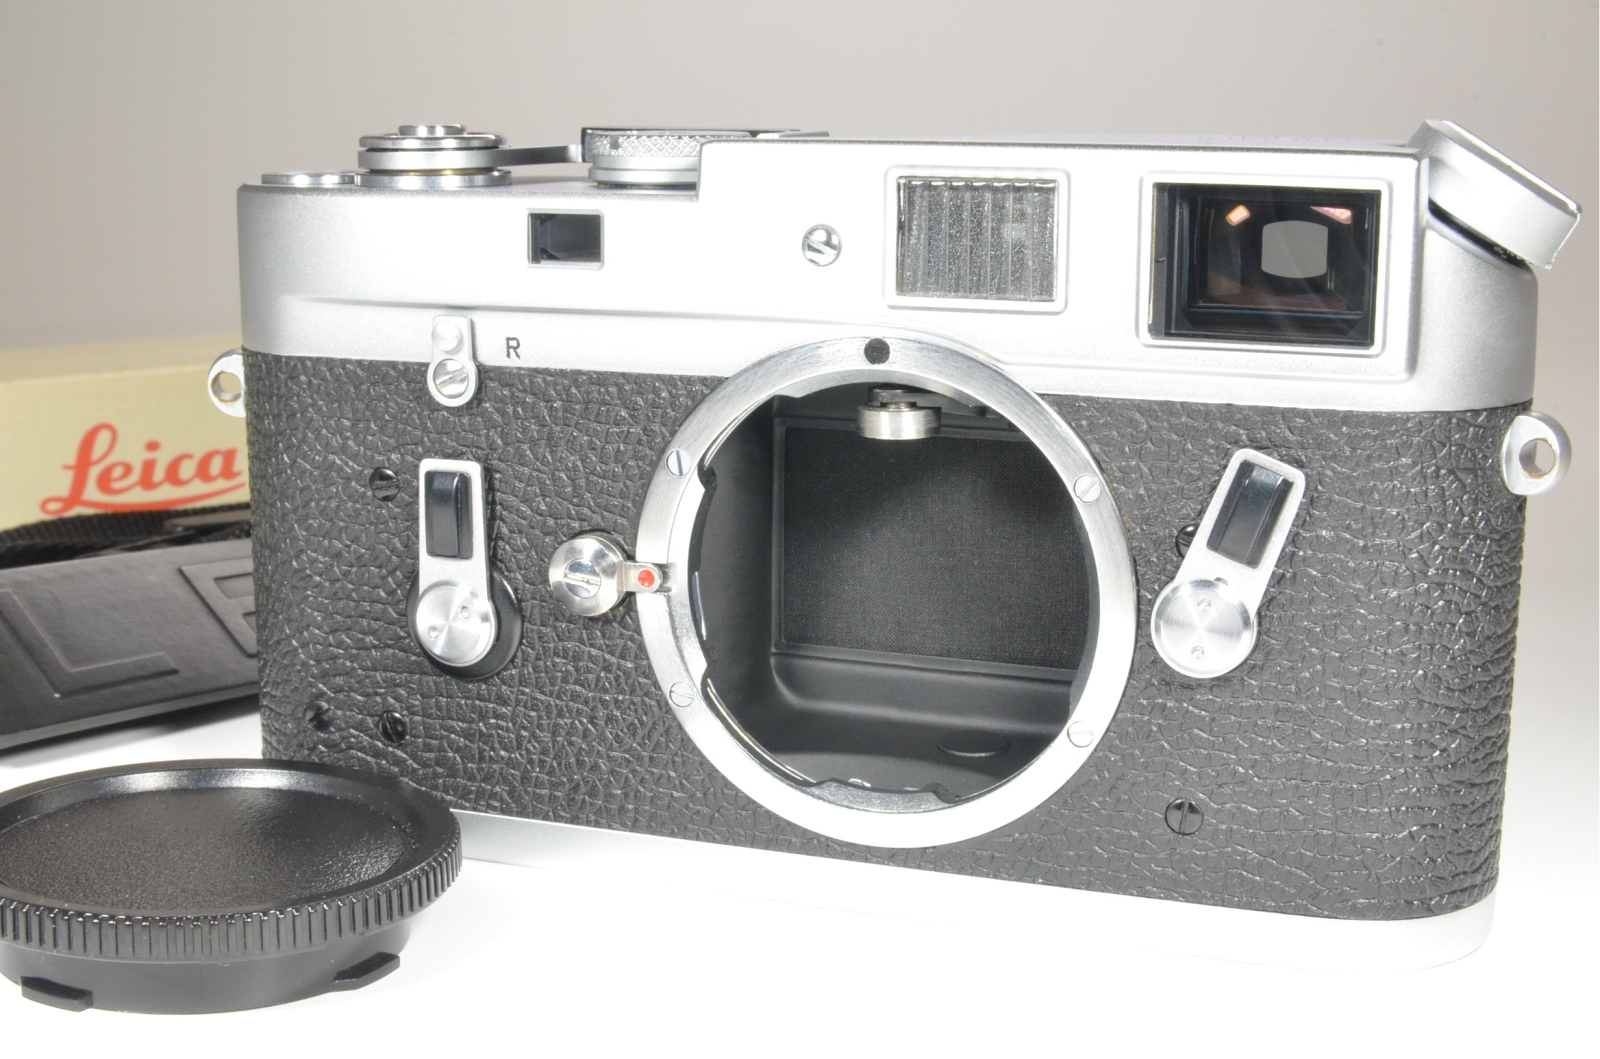 leica m4 35mm rangefinder film camera s/n 1230551 year 1969 with strap